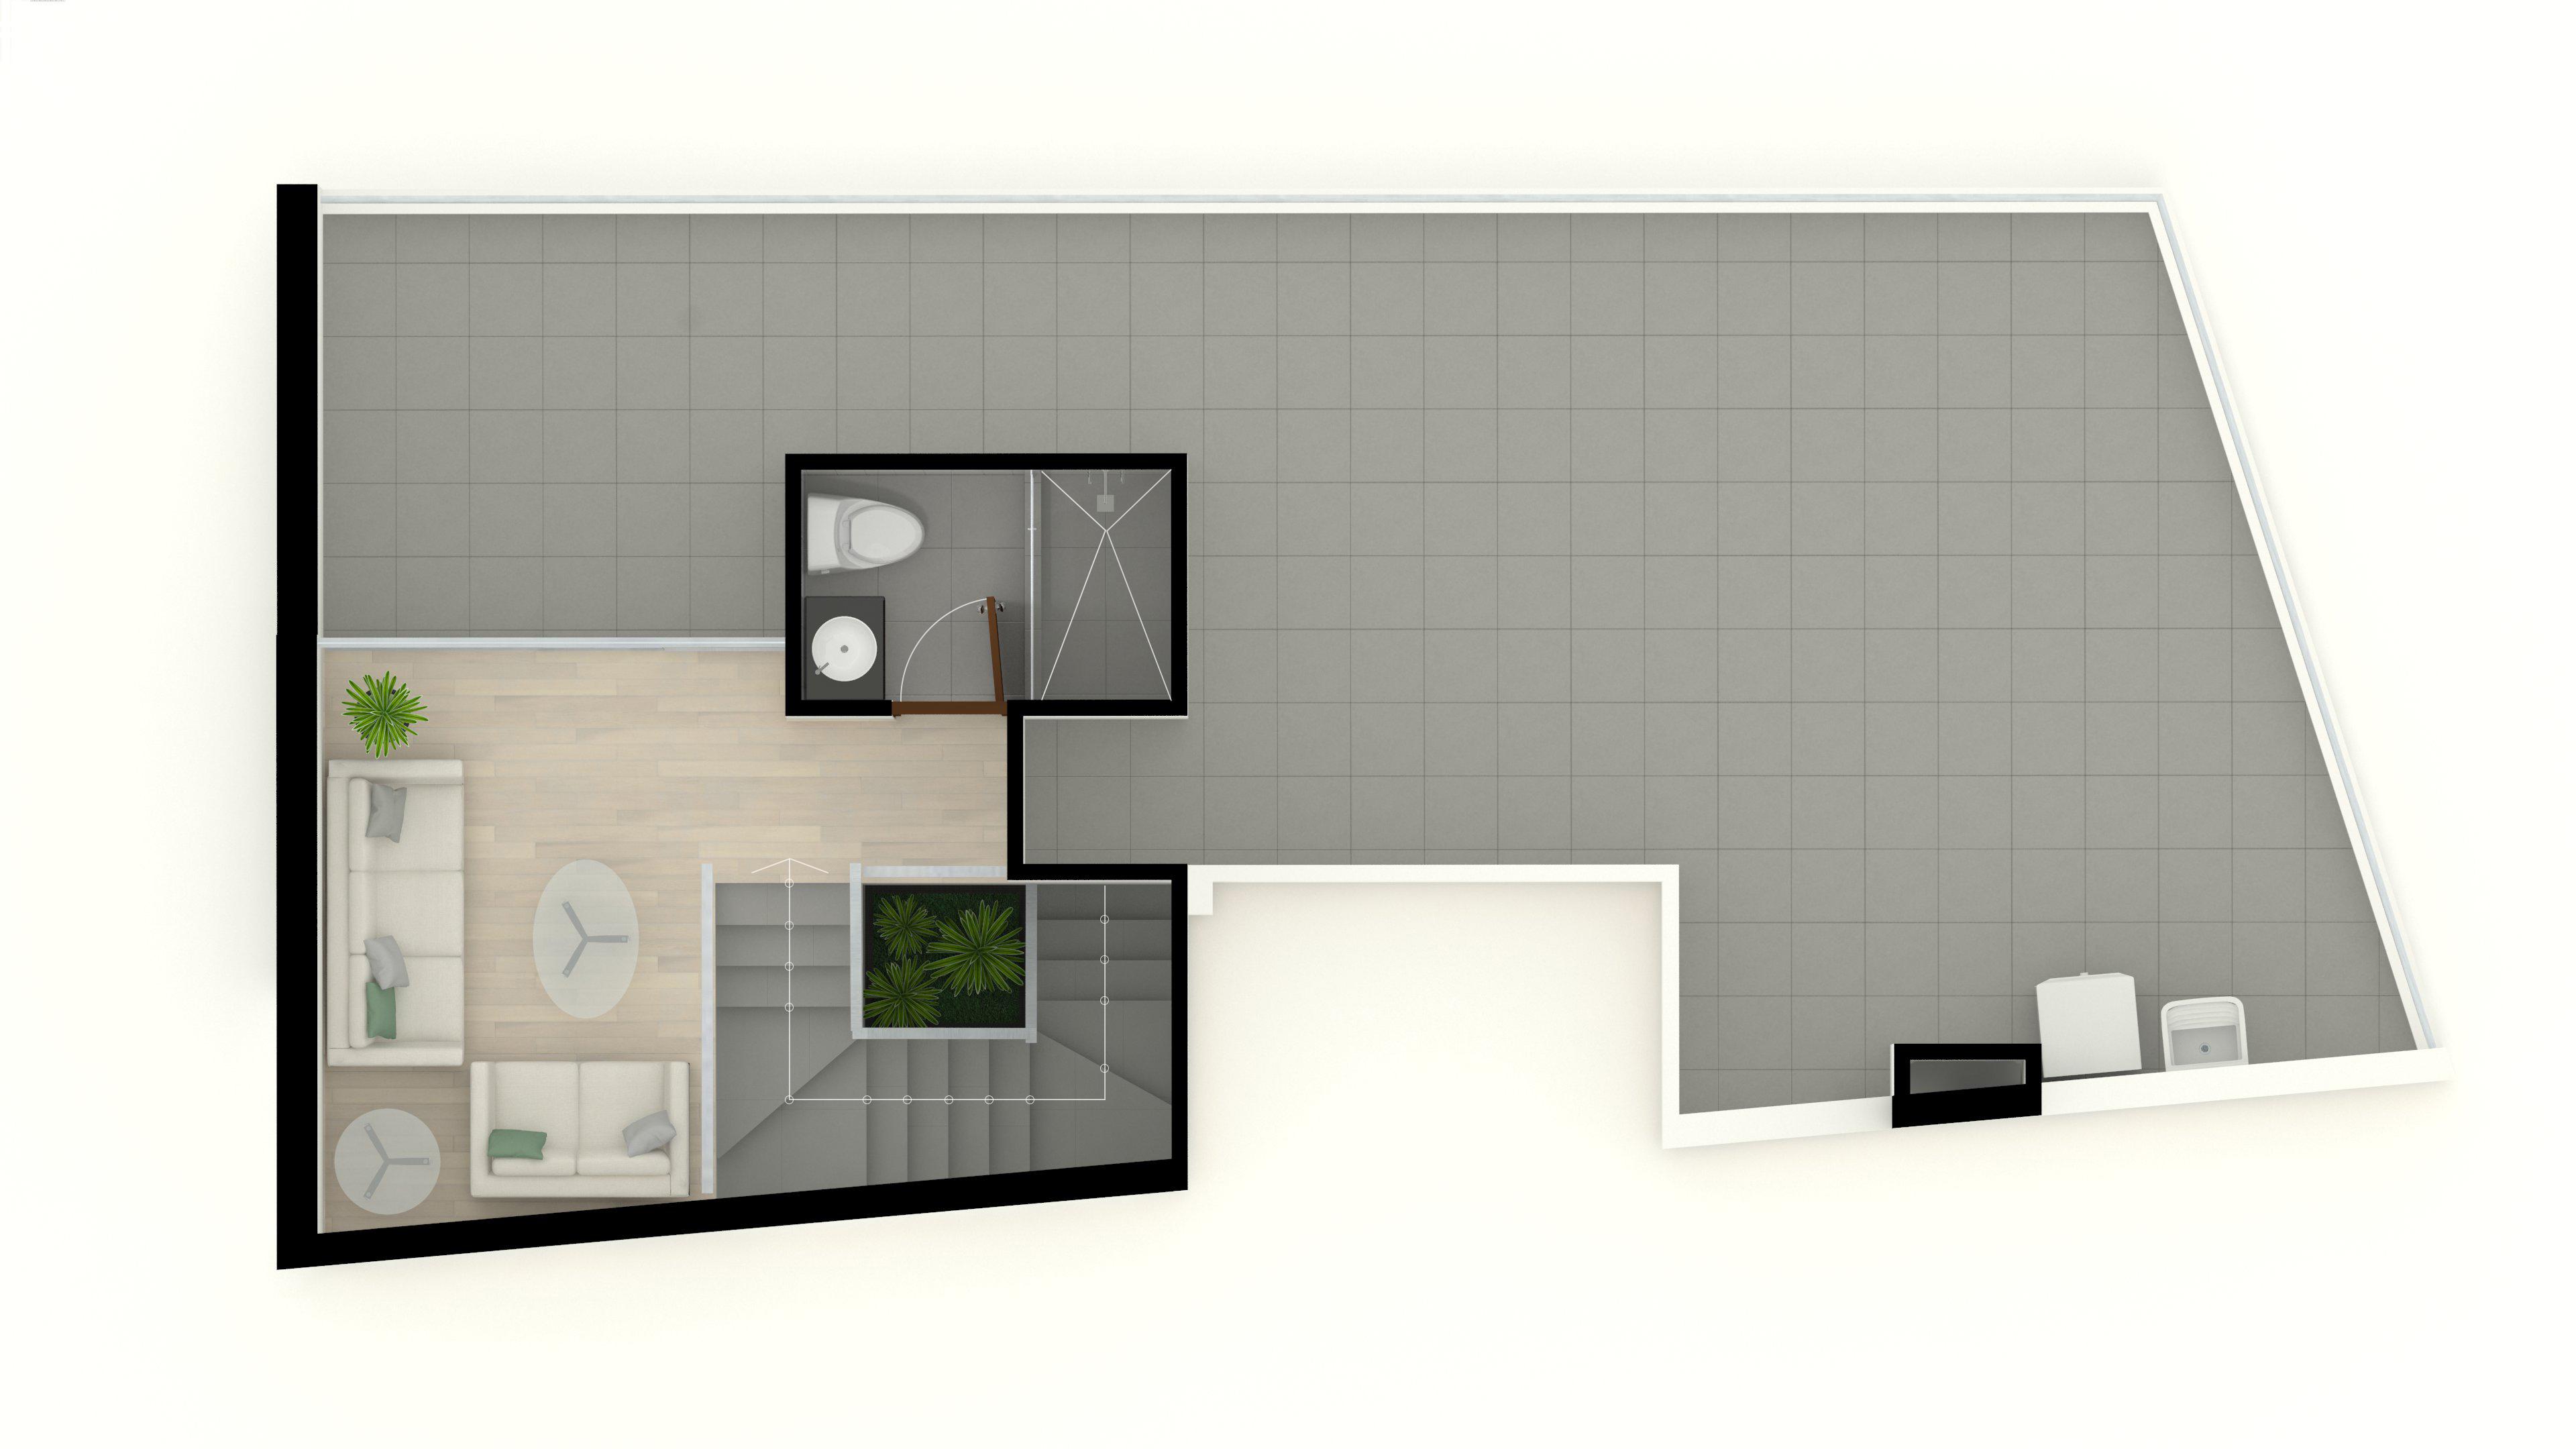 5. Duplex 501 6to piso 17m2 (Segundo Nivel)